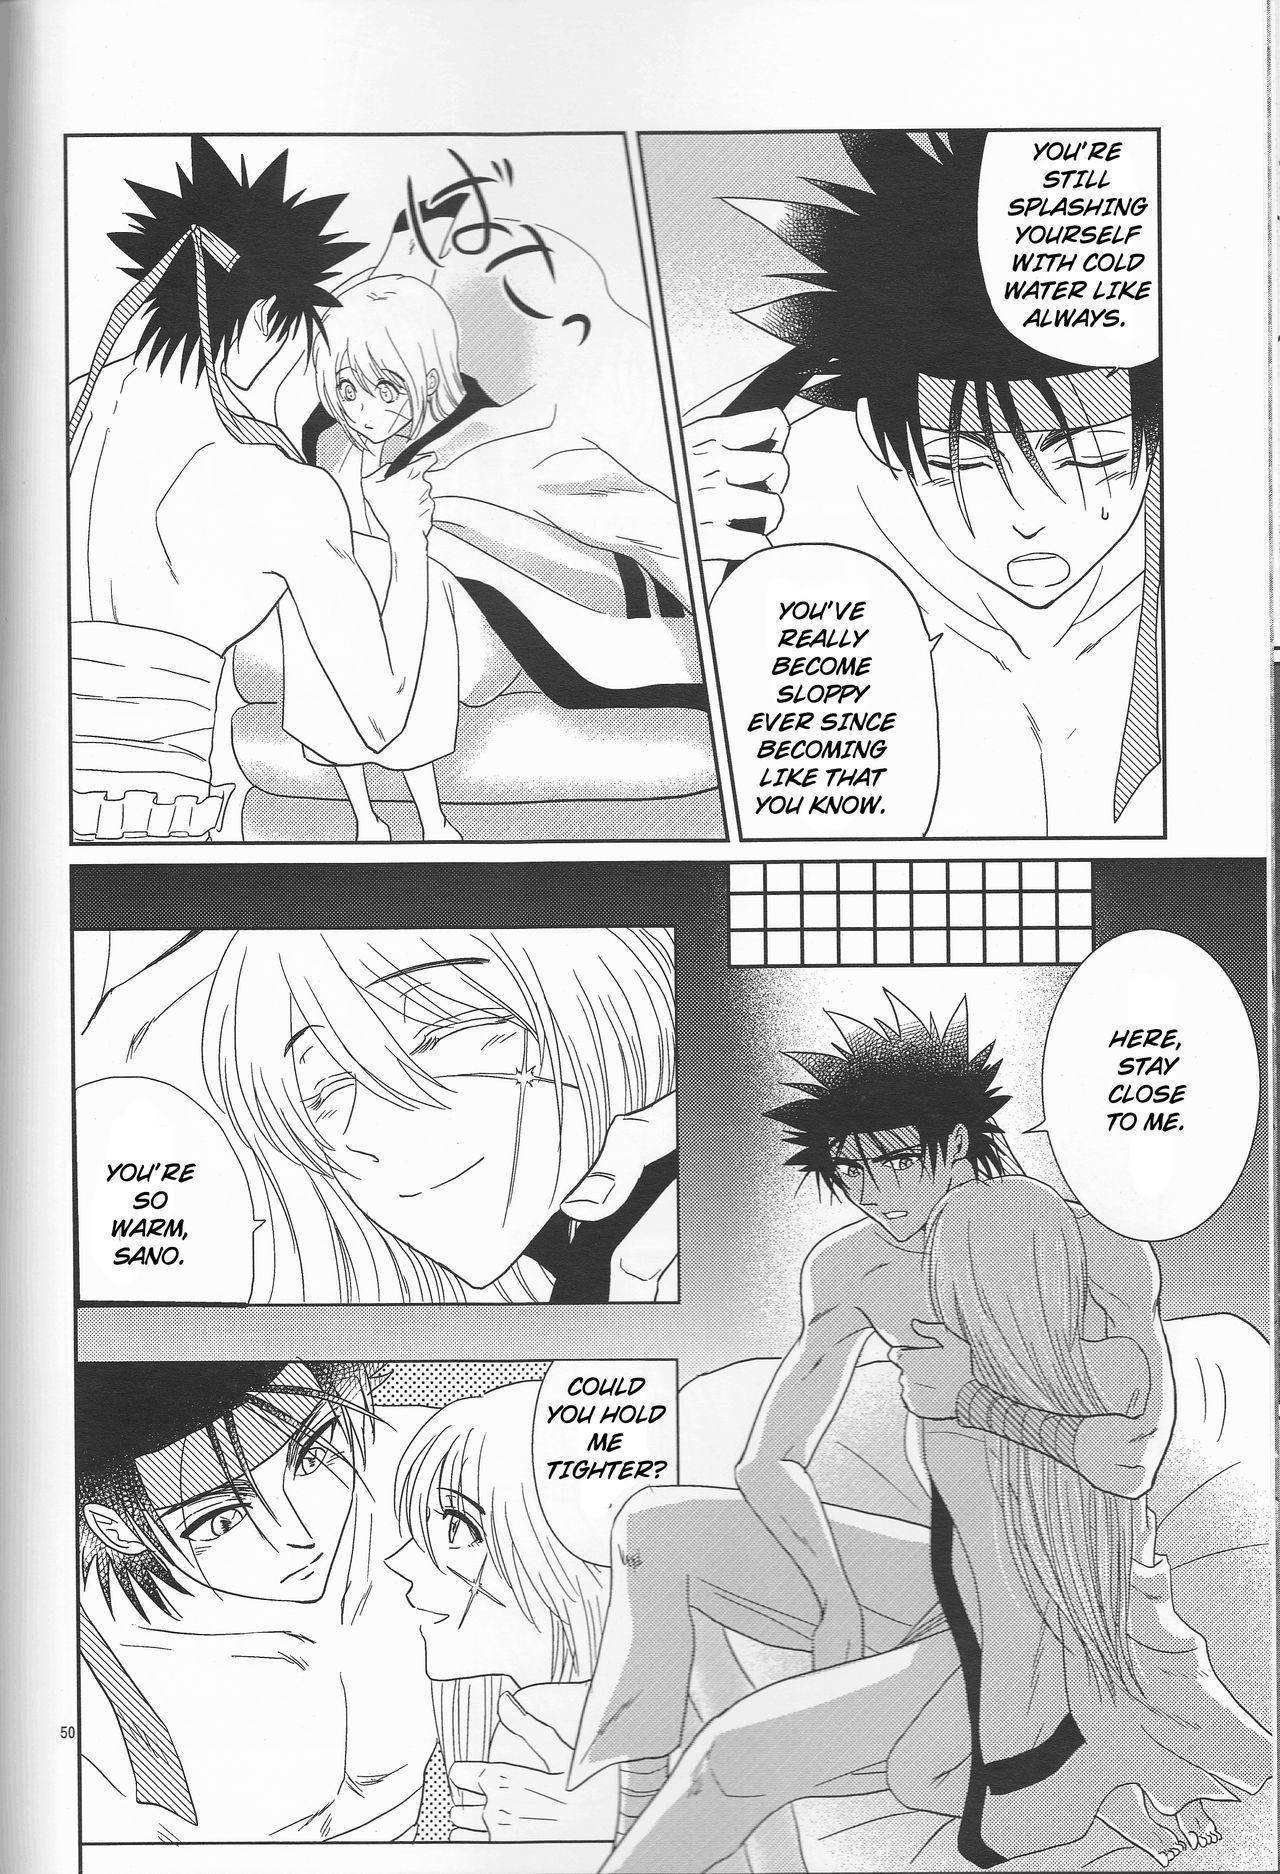 Hime ken ryoran page 50